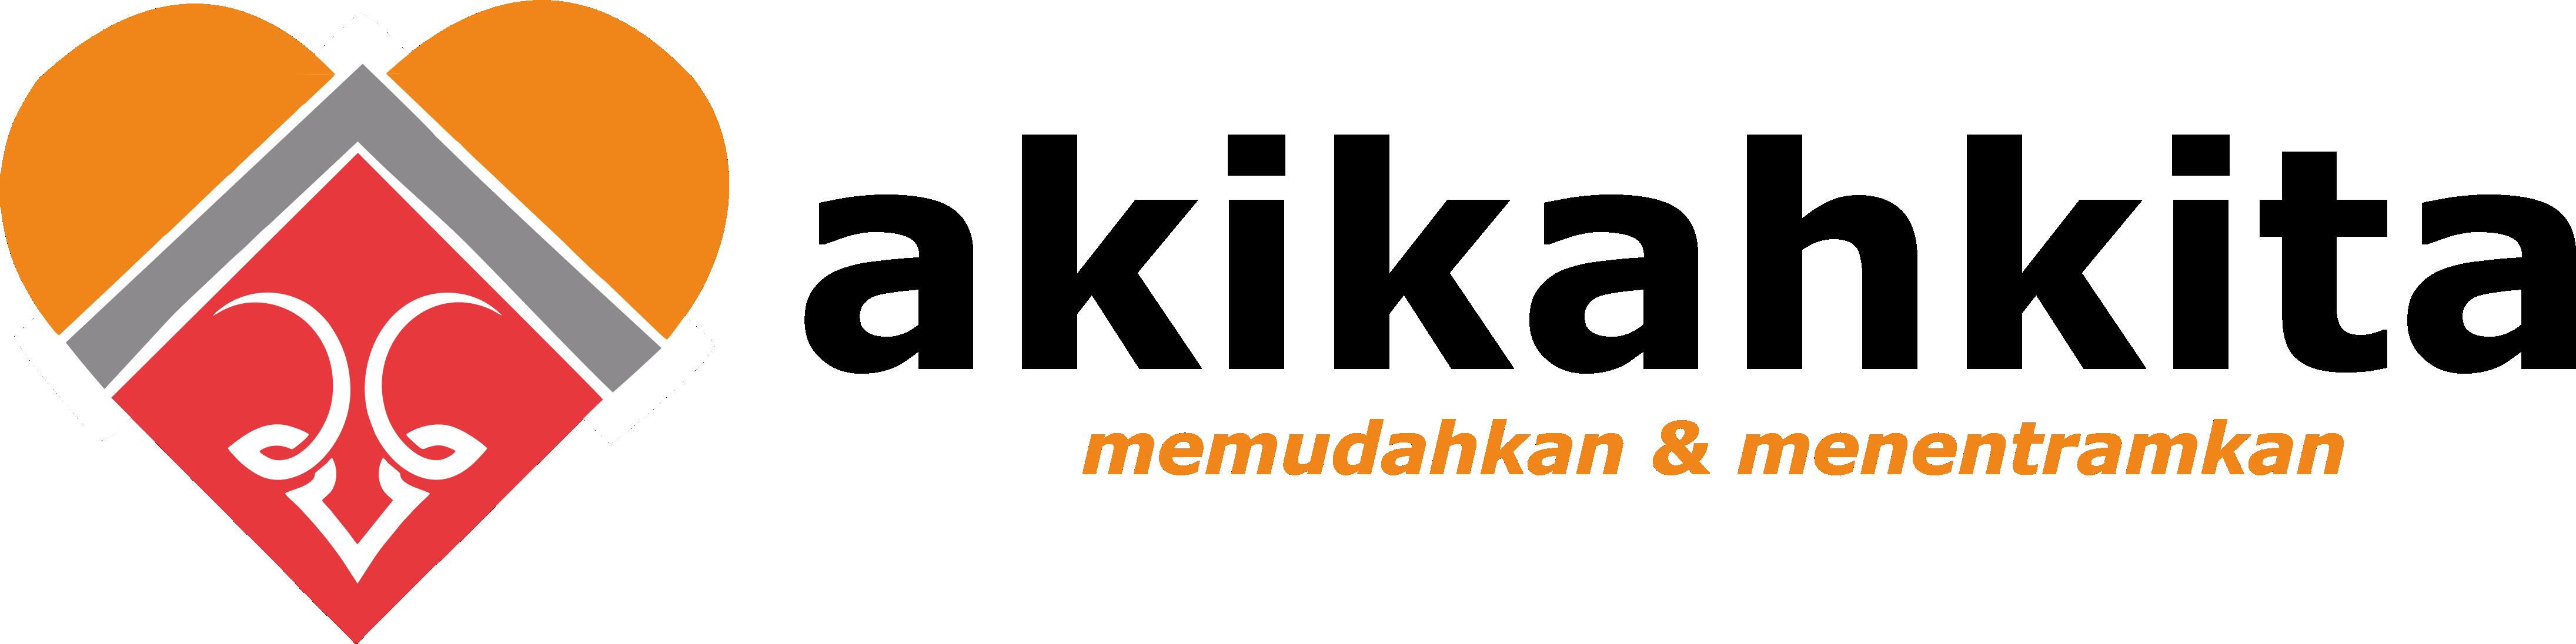 Akikahkita.com